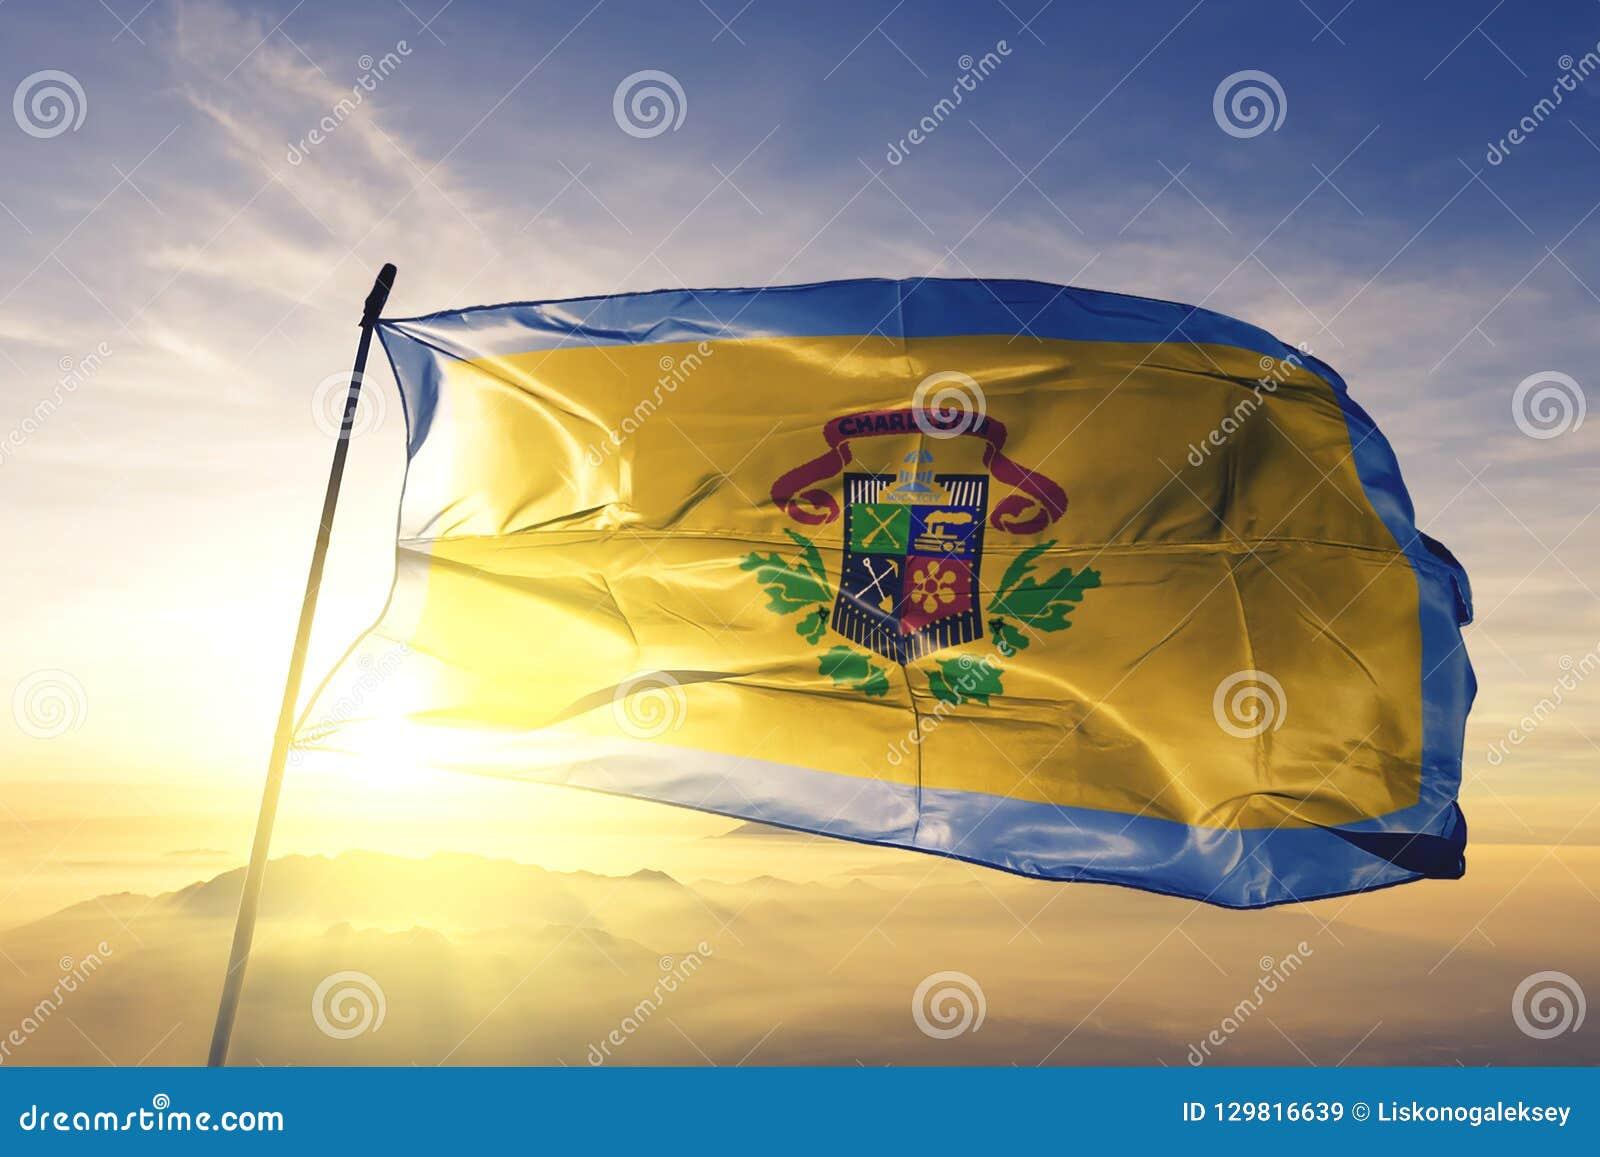 Charleston city capital of West Virginia of United States flag textile cloth fabric waving on the top sunrise mist fog